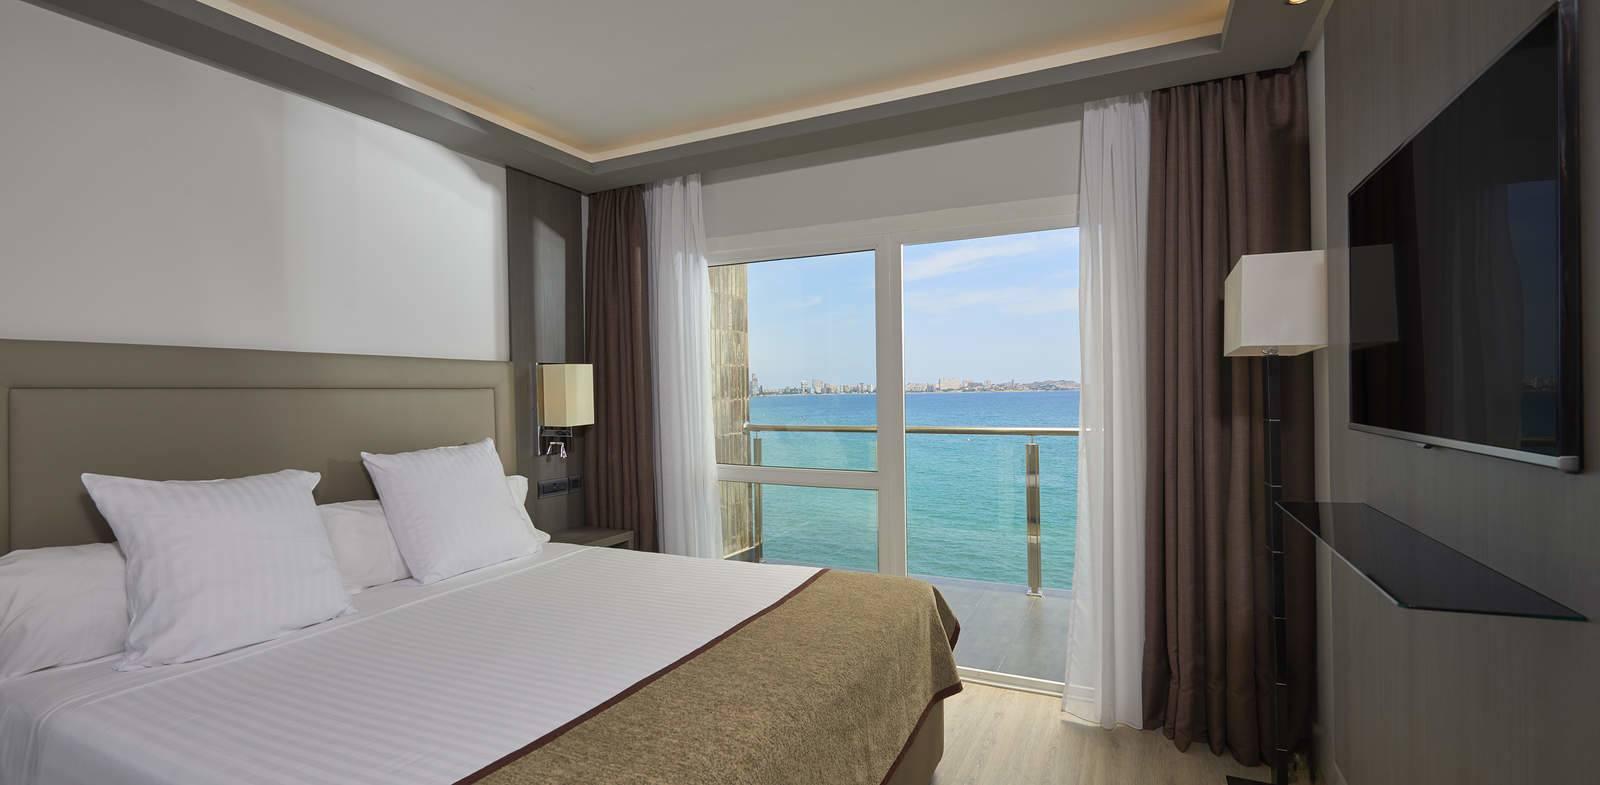 Junior suite Ejecutiva del hotel Melia Alicante